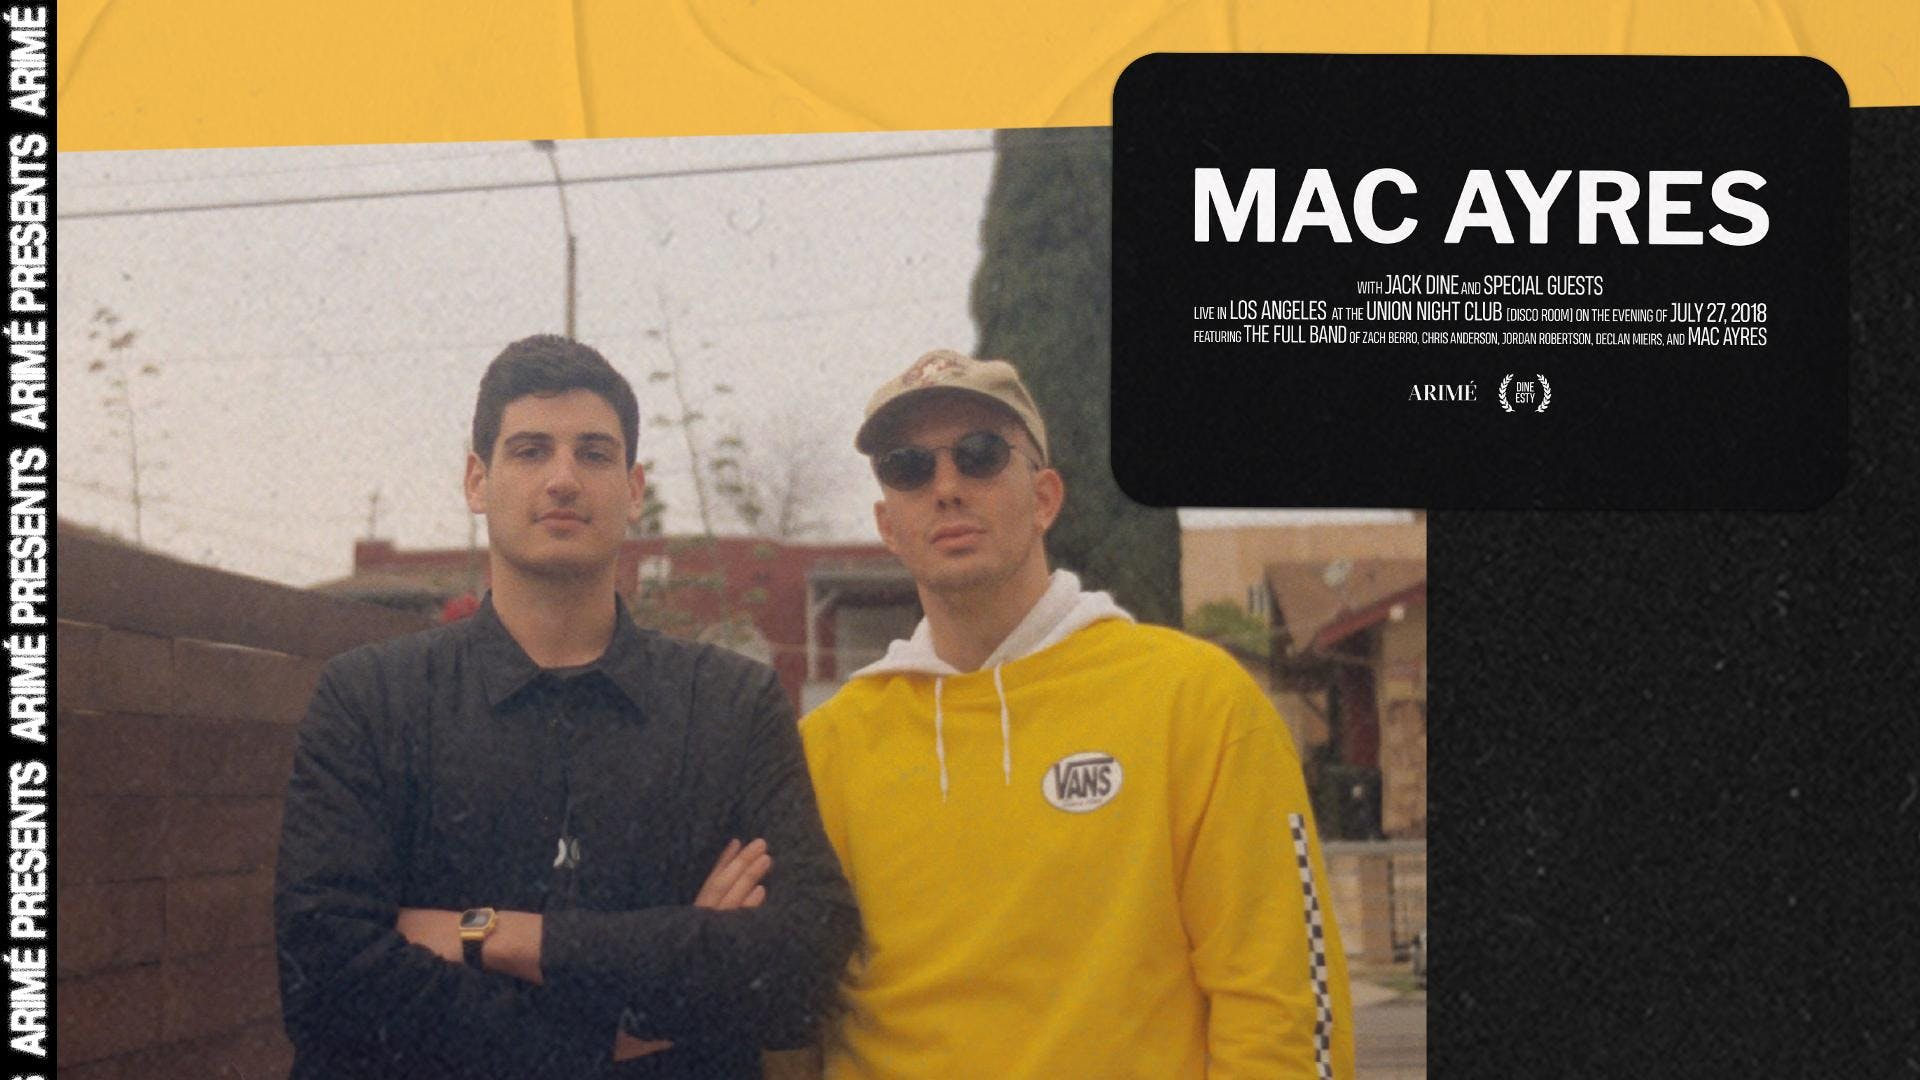 Meet Greet With Mac Ayres And Jack Dine 27 Jul 2018